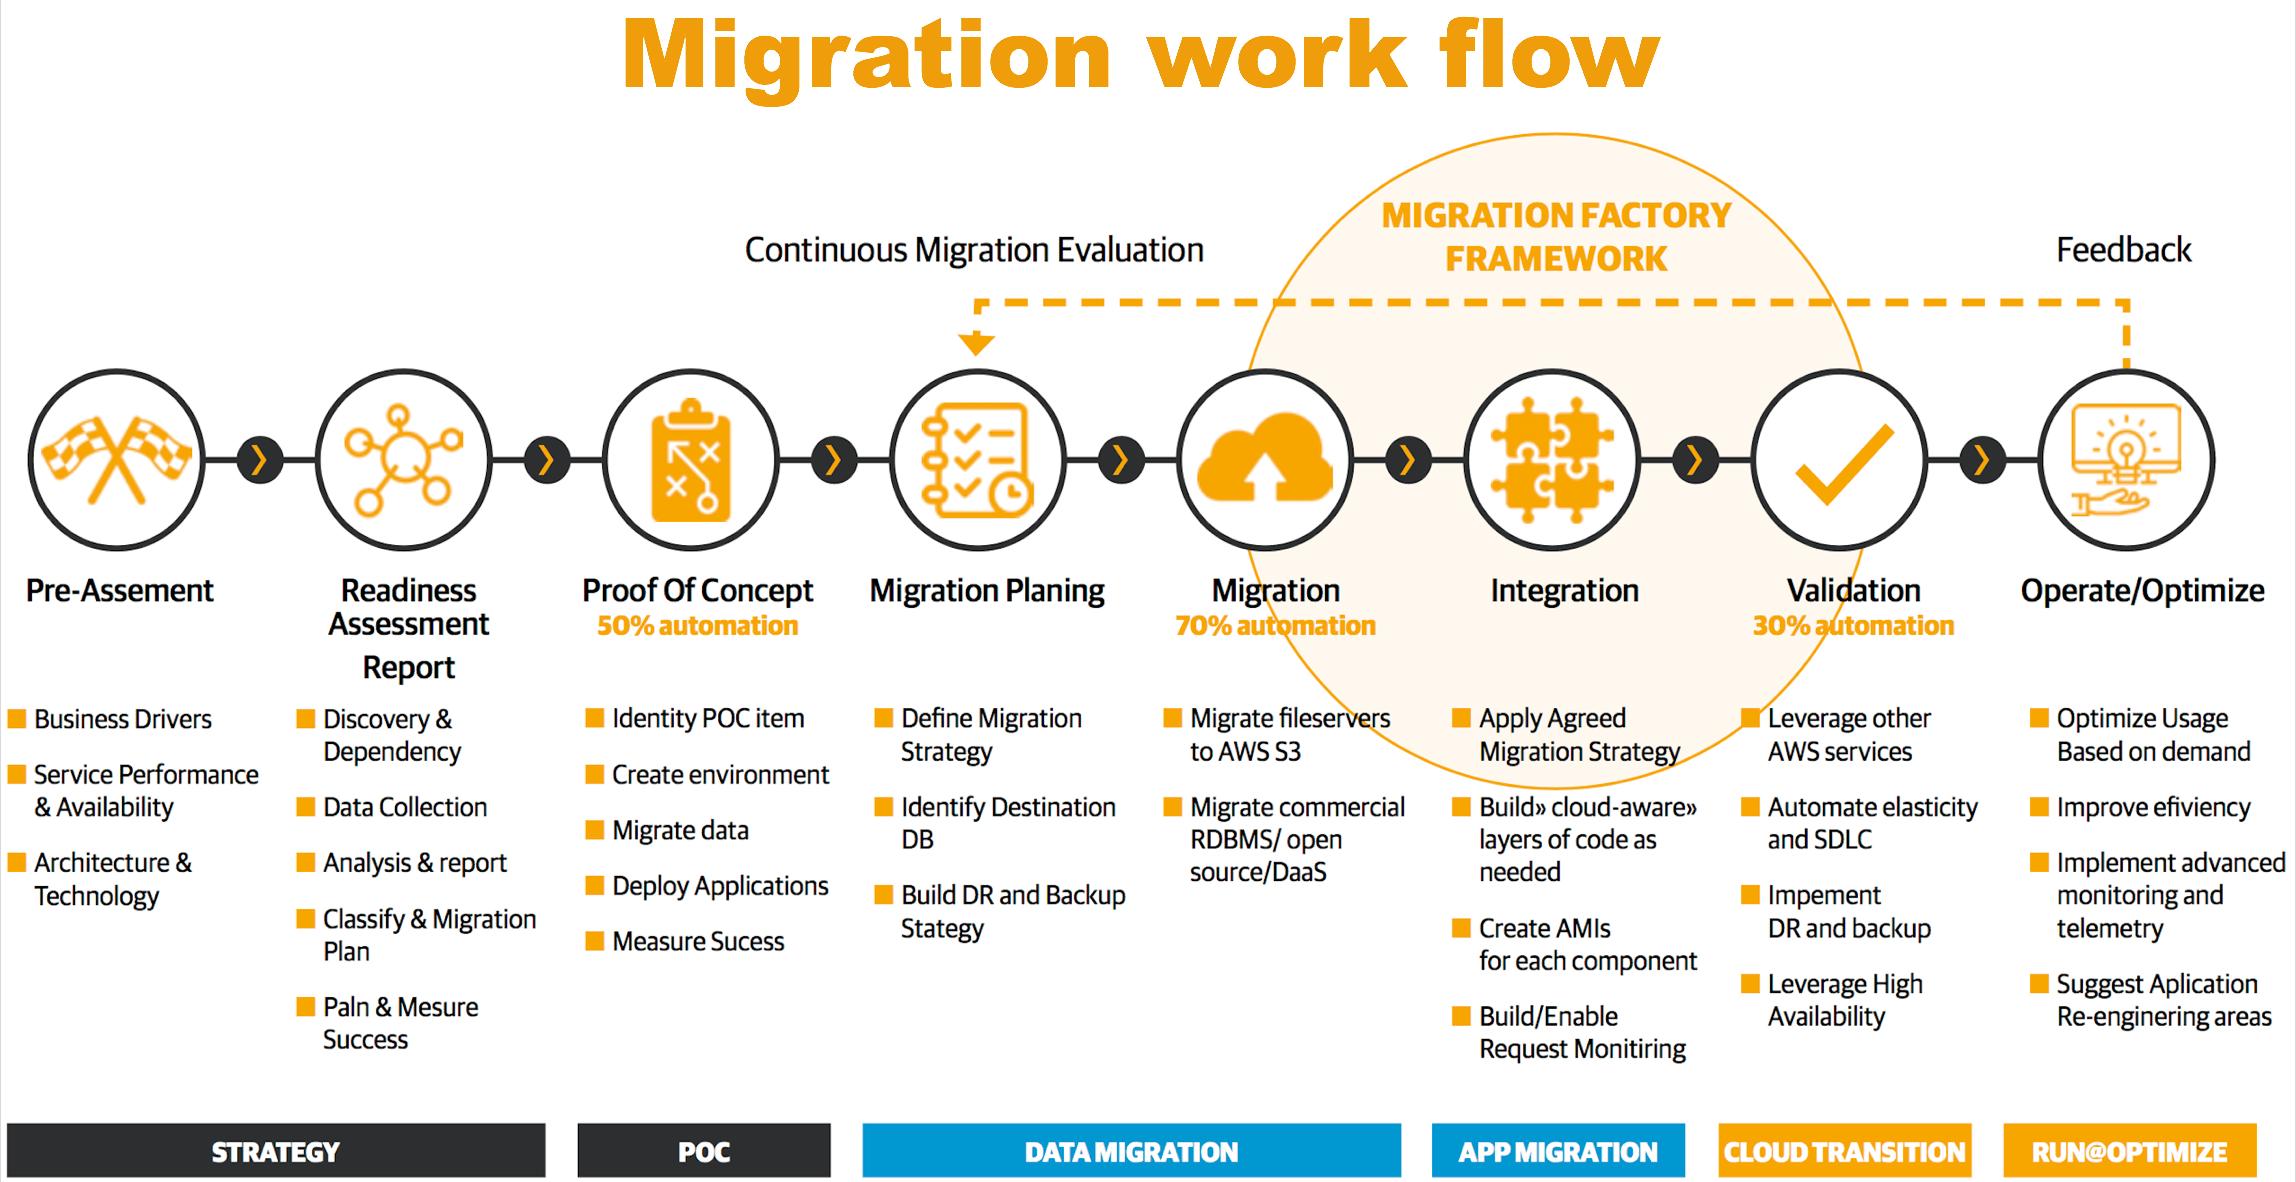 Migraton work flow